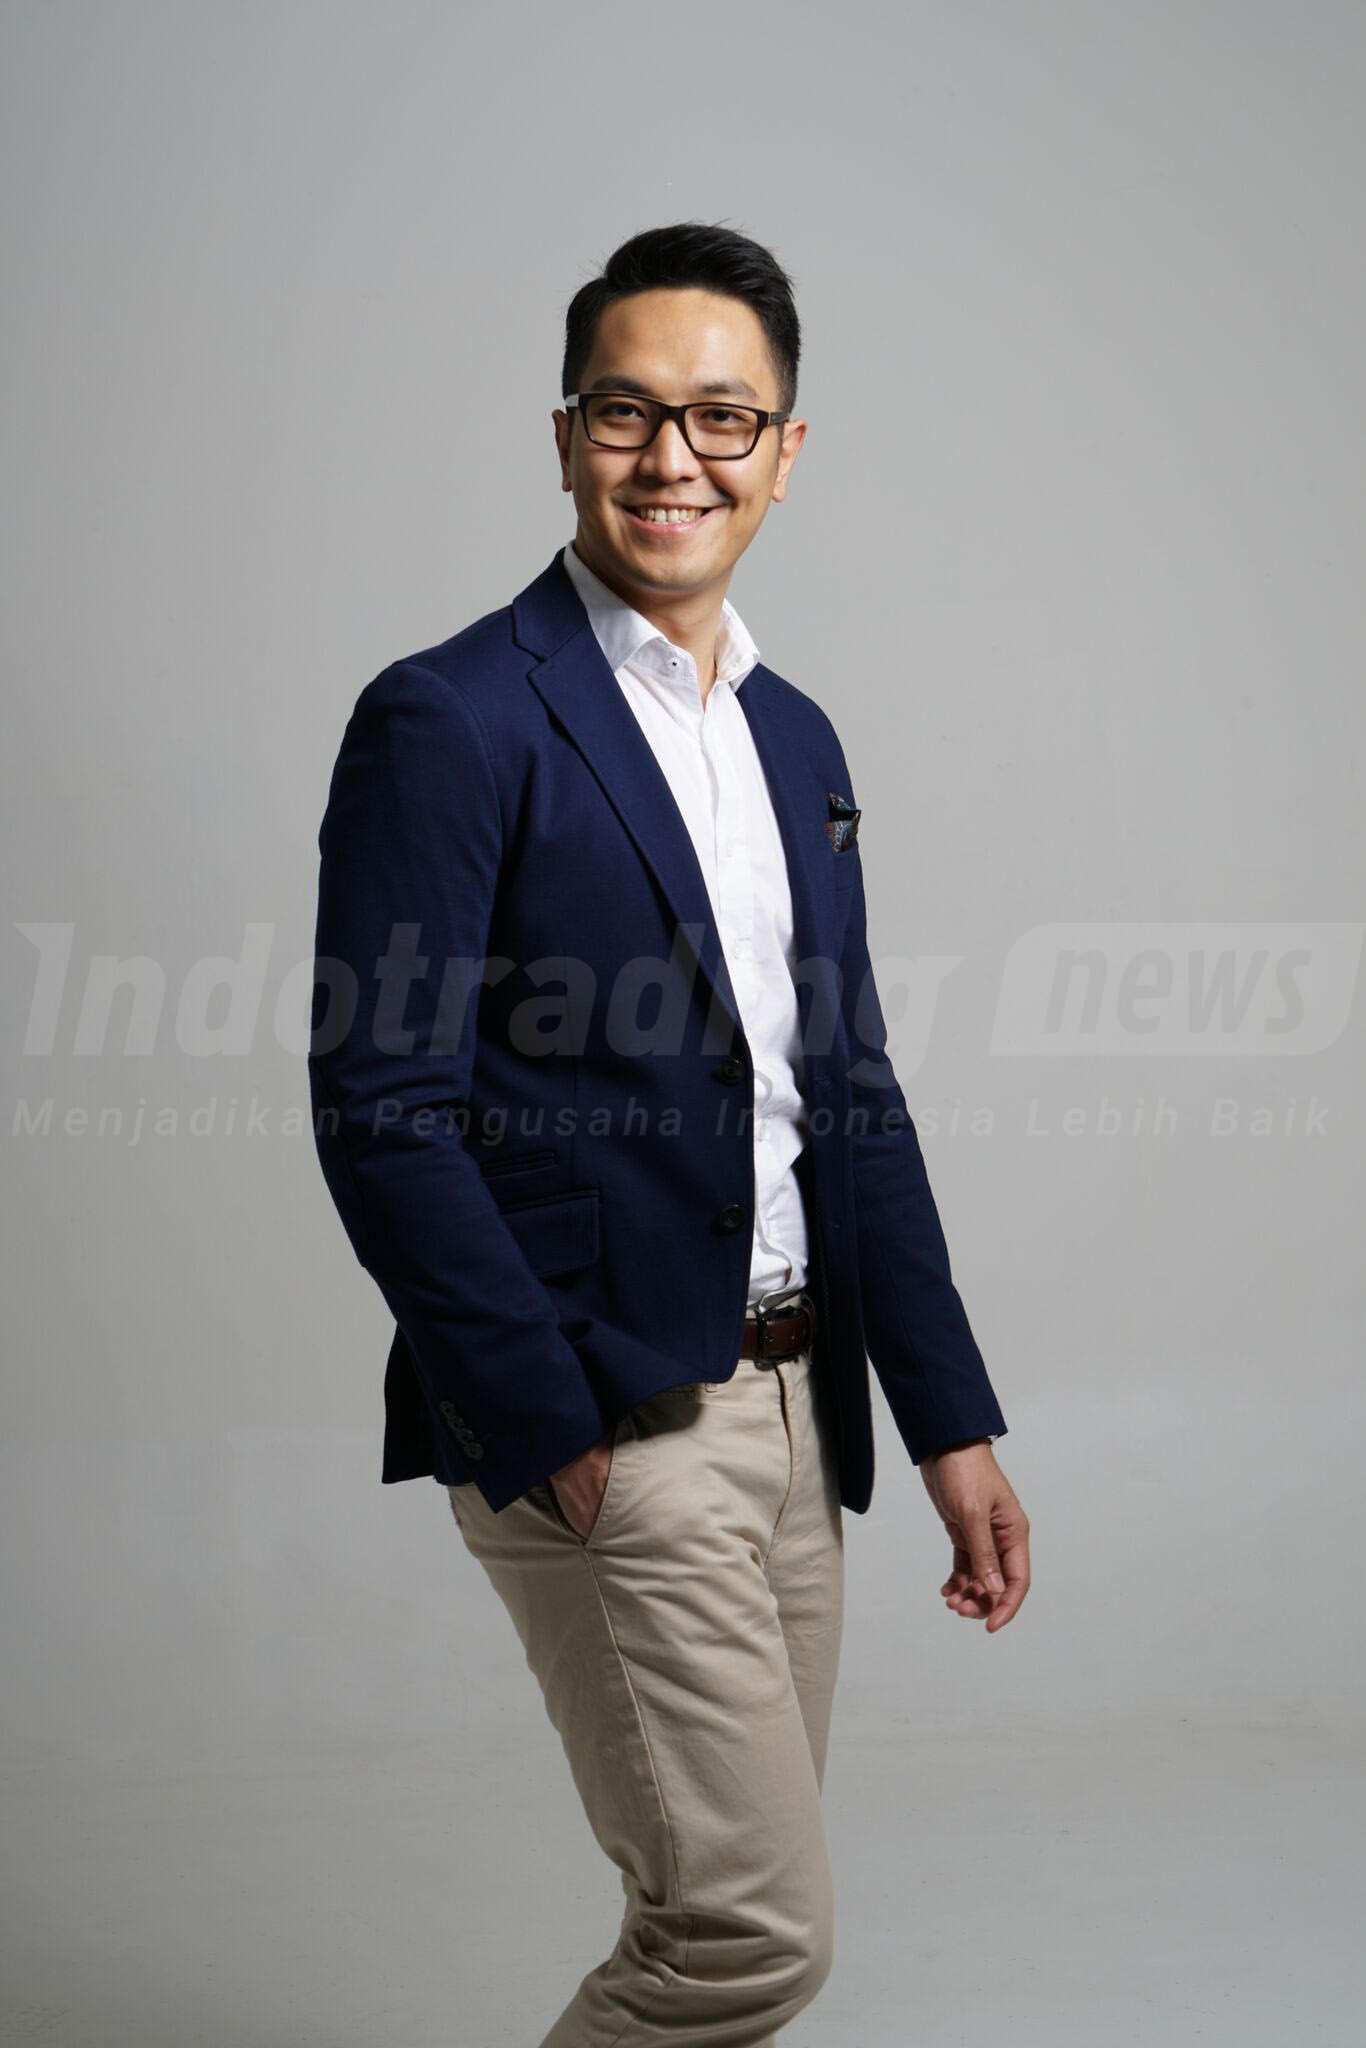 Foto: CEO Trinity Property Group, Bong Chandra/Dok: Koleksi pribadi Bong Chandra